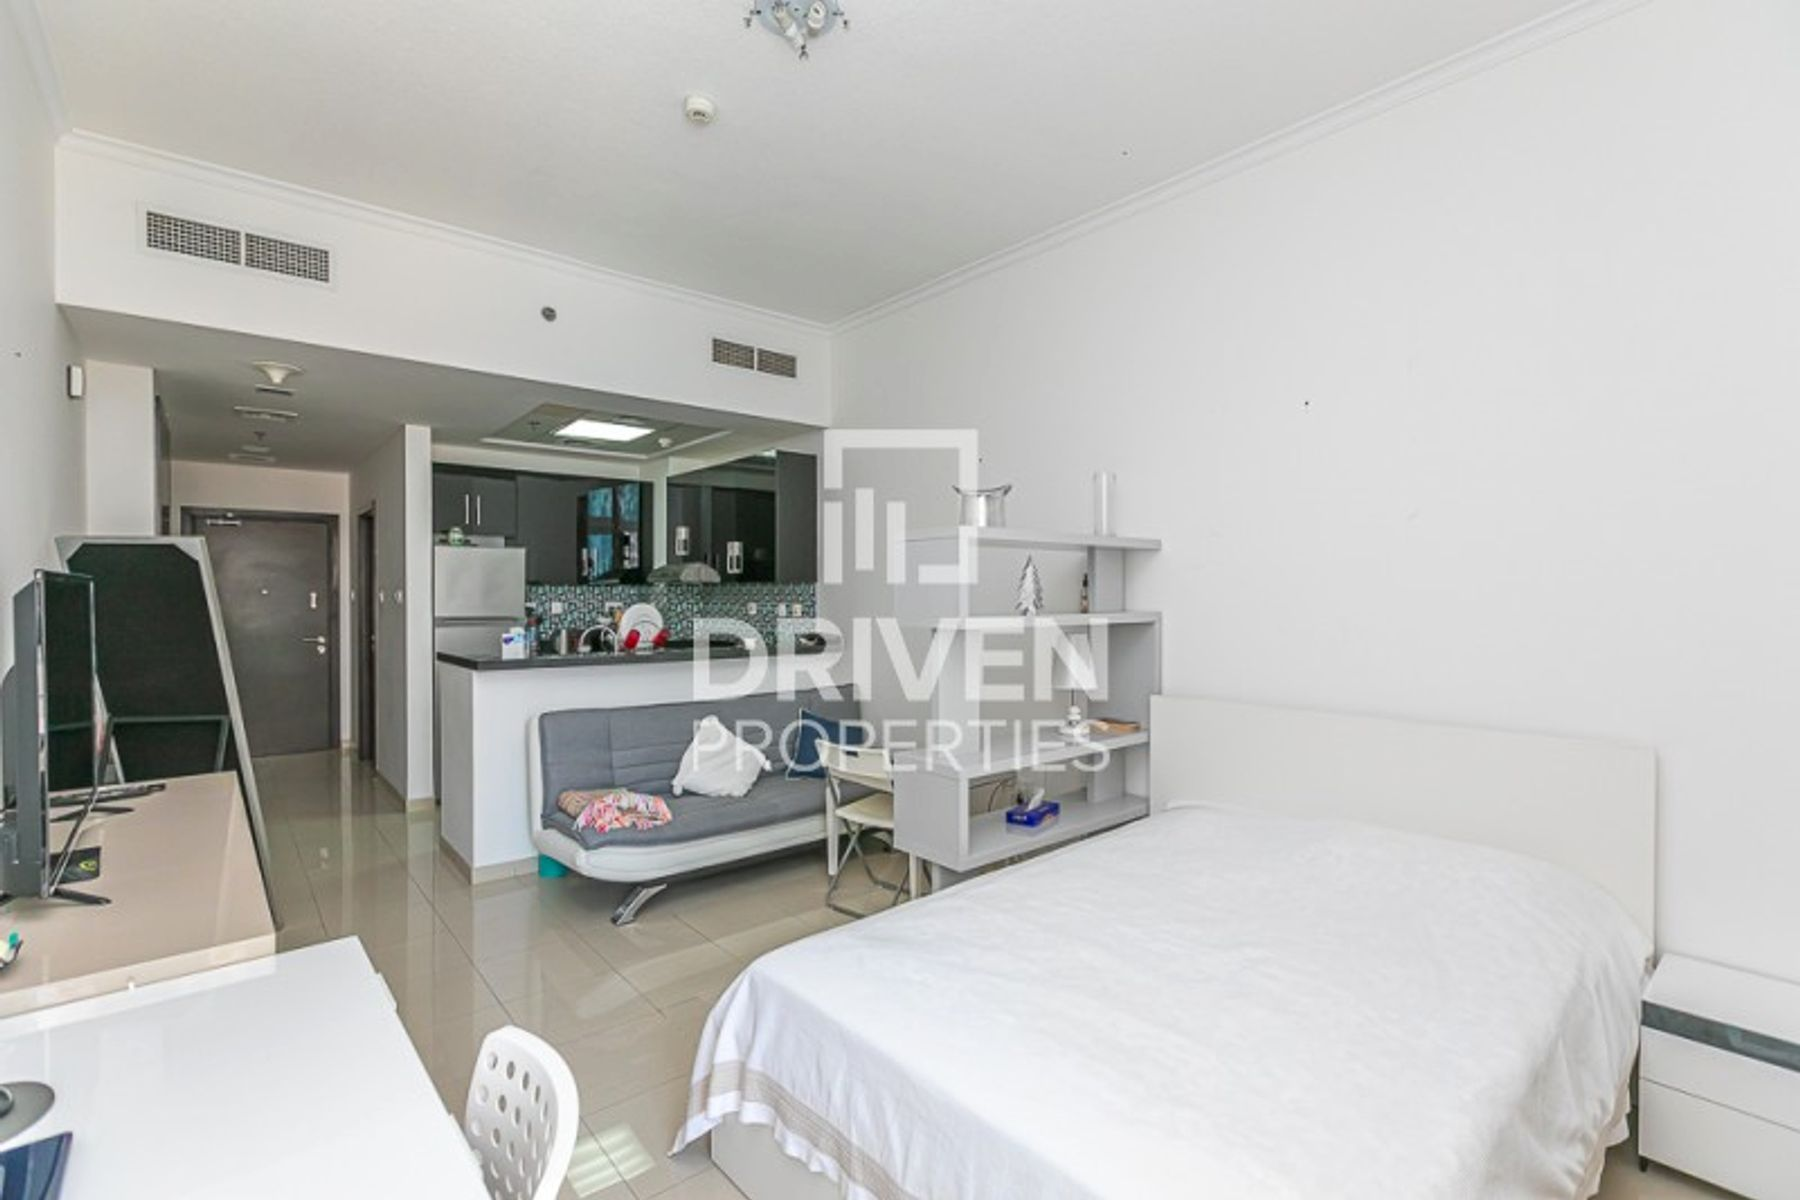 Studio for Rent in Botanica Tower, Dubai Marina